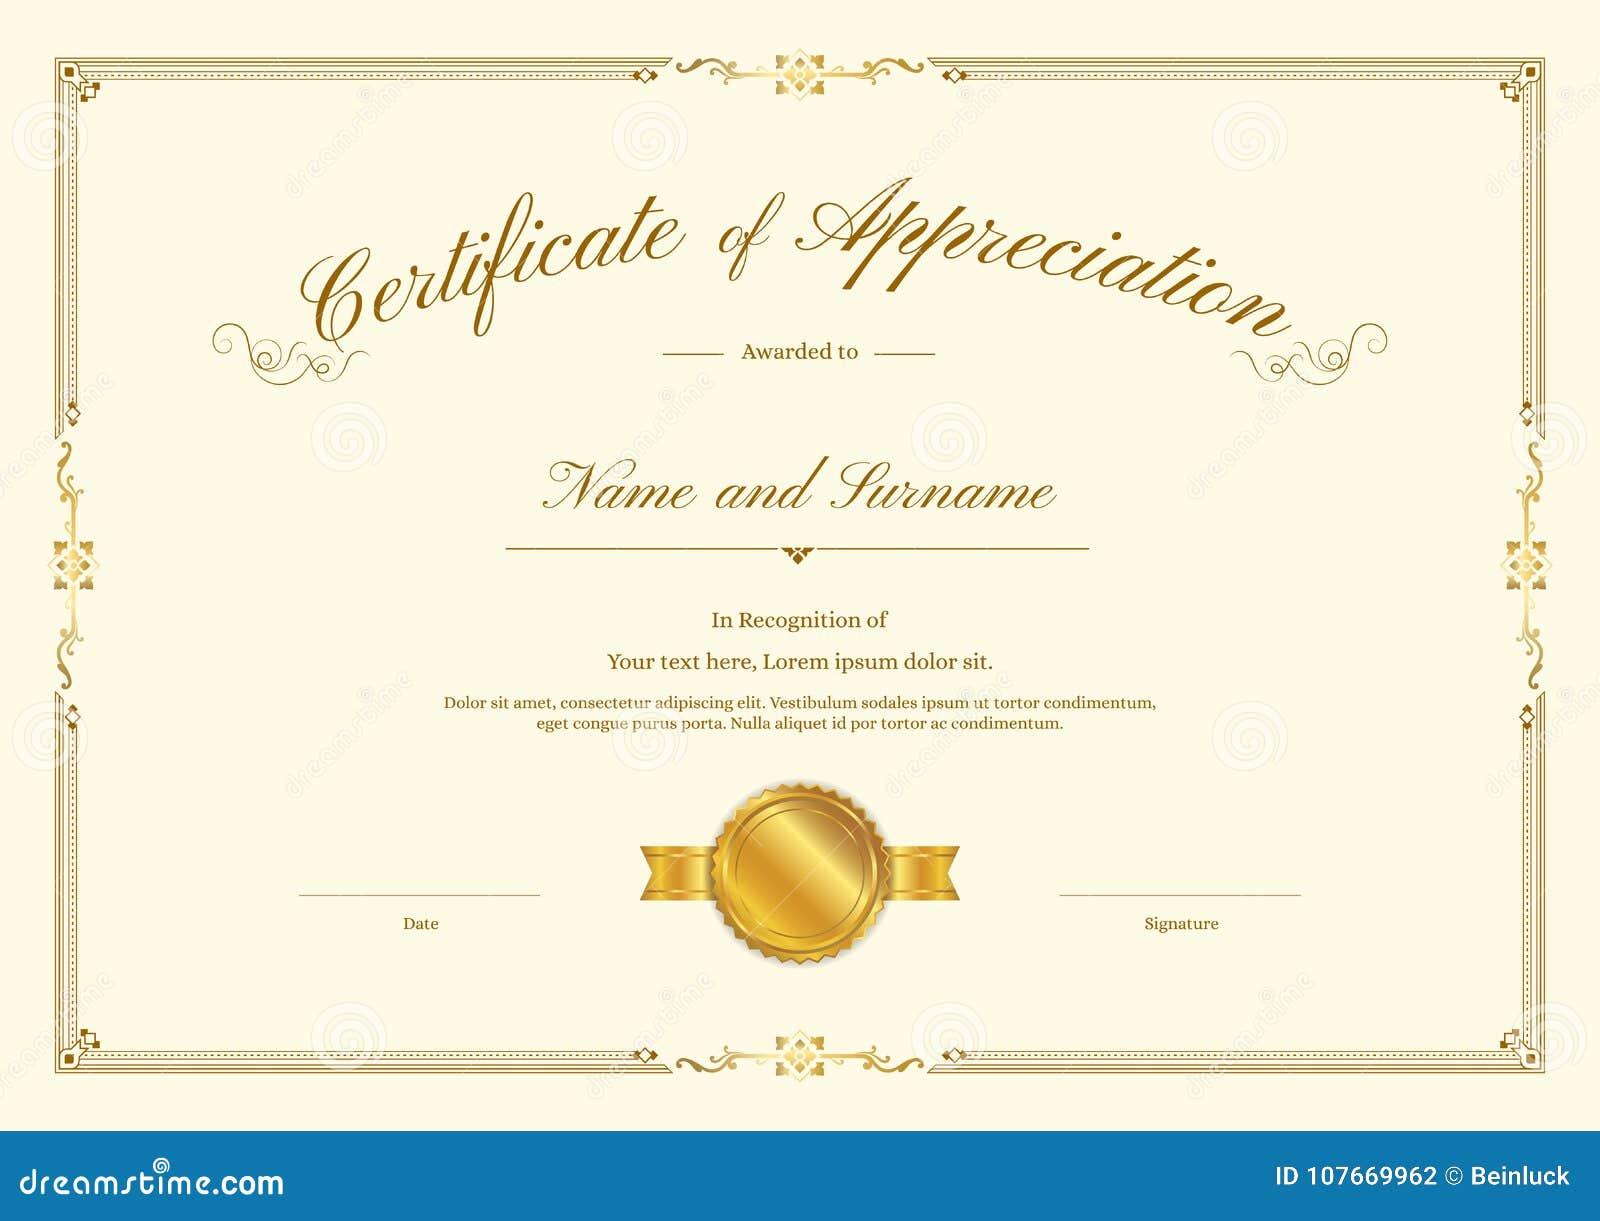 Luxury certificate template with elegant border frame, Diploma design